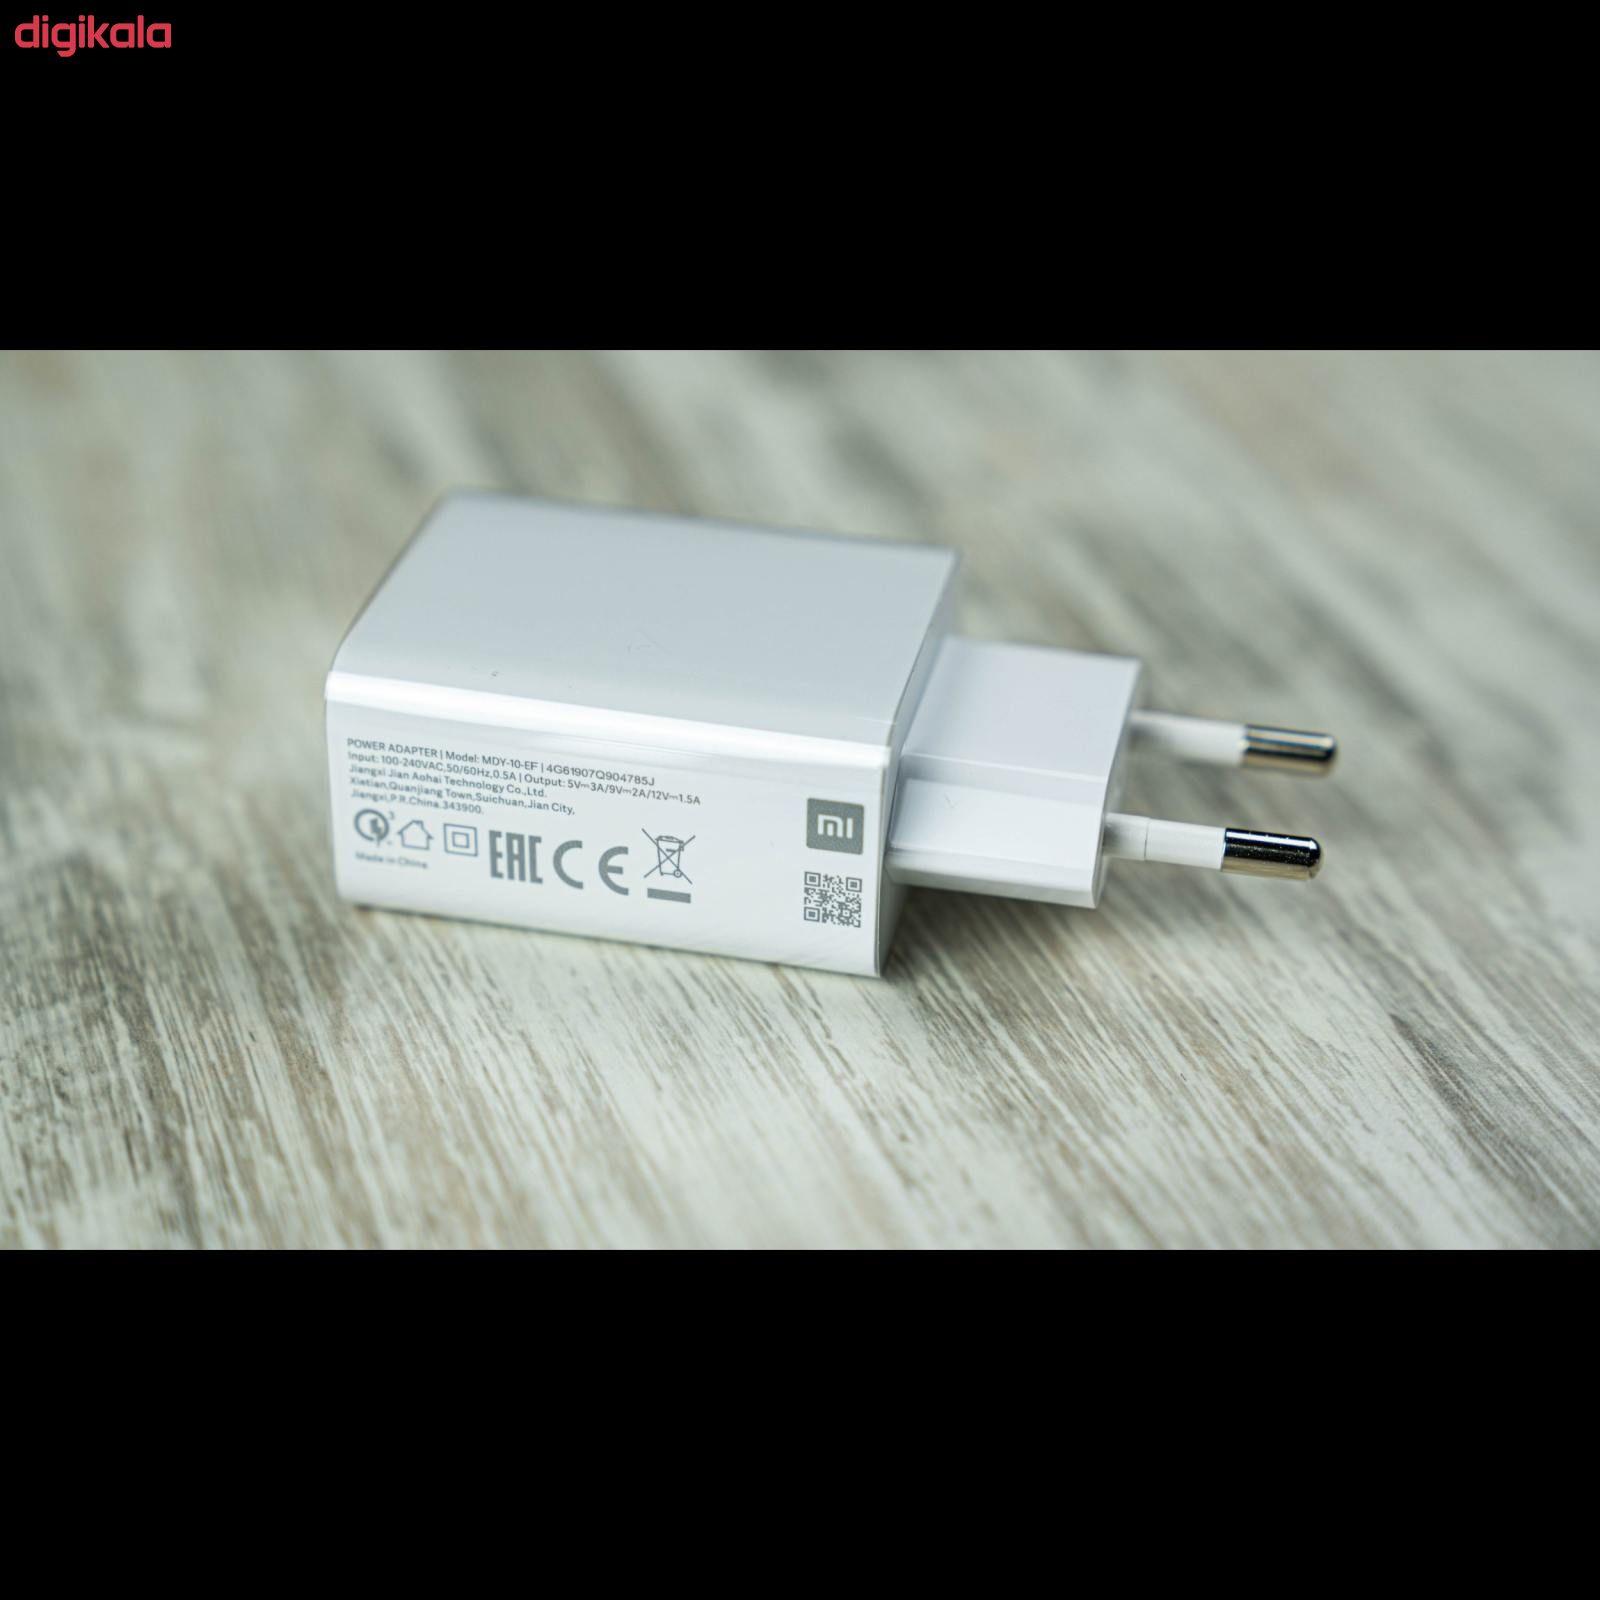 شارژر دیواری شیائومی مدل MDY-10-EF به همراه کابل تبدیل USB-C main 1 2